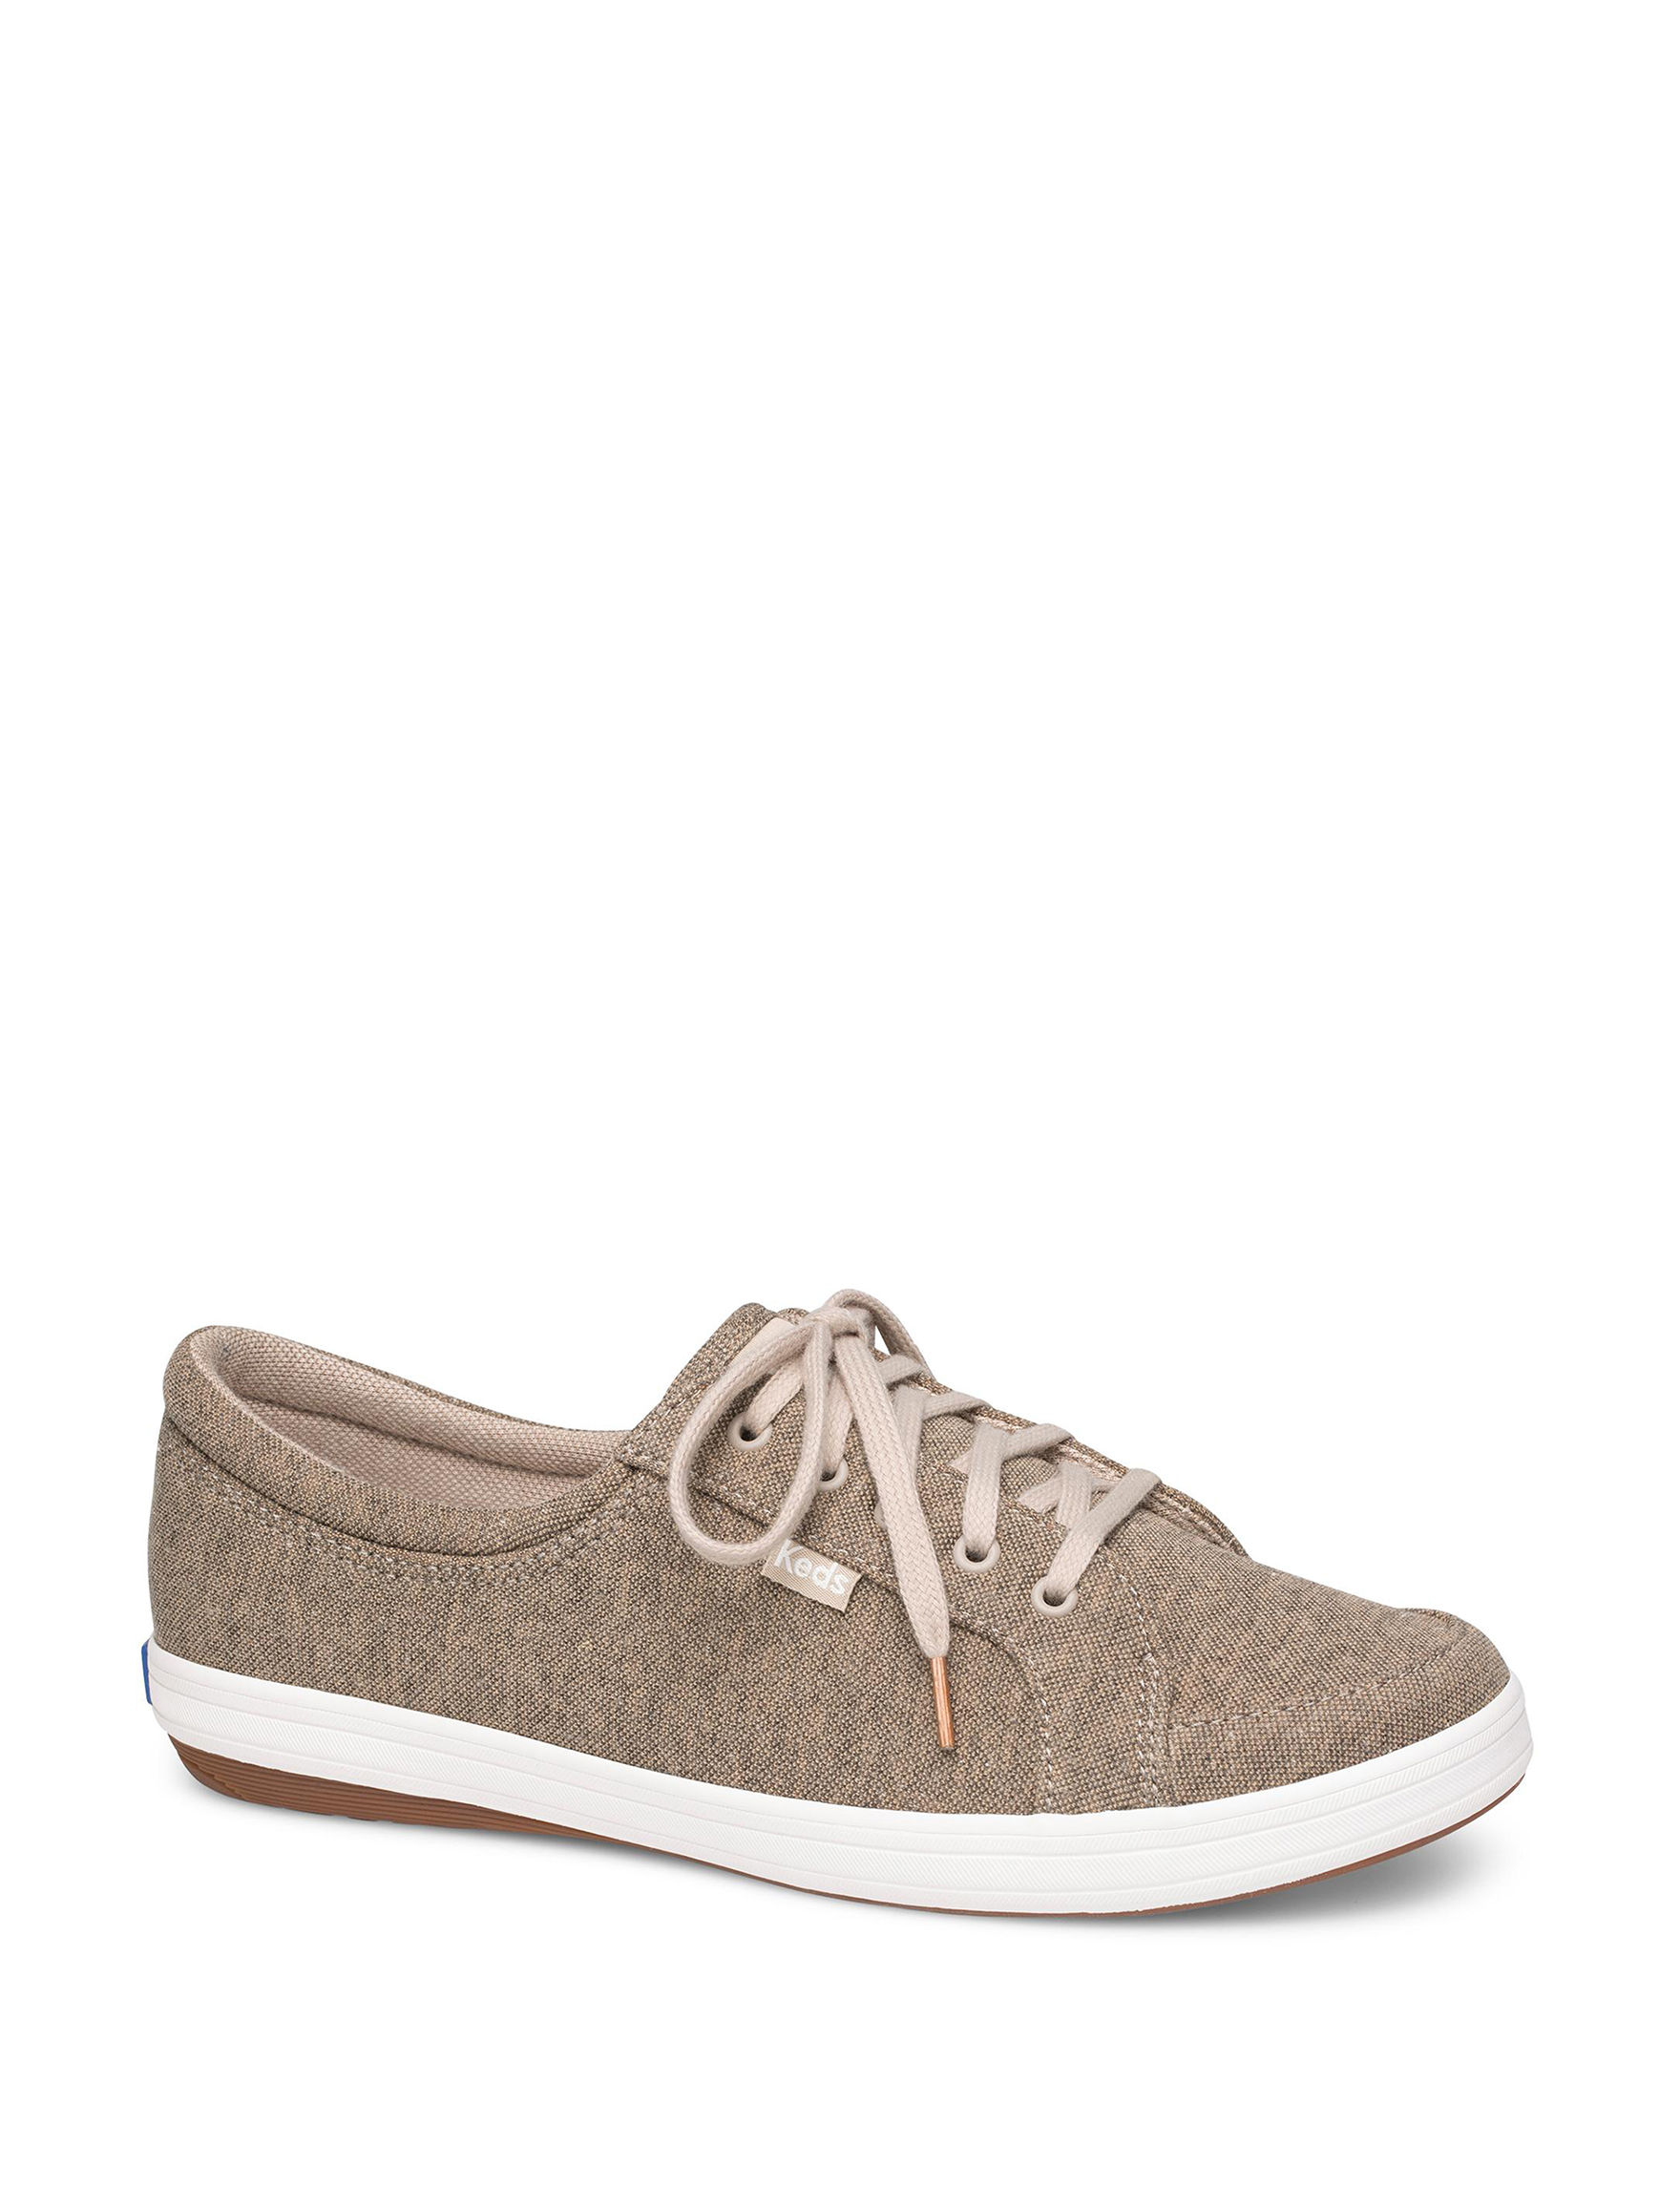 Keds Walnut Comfort Shoes